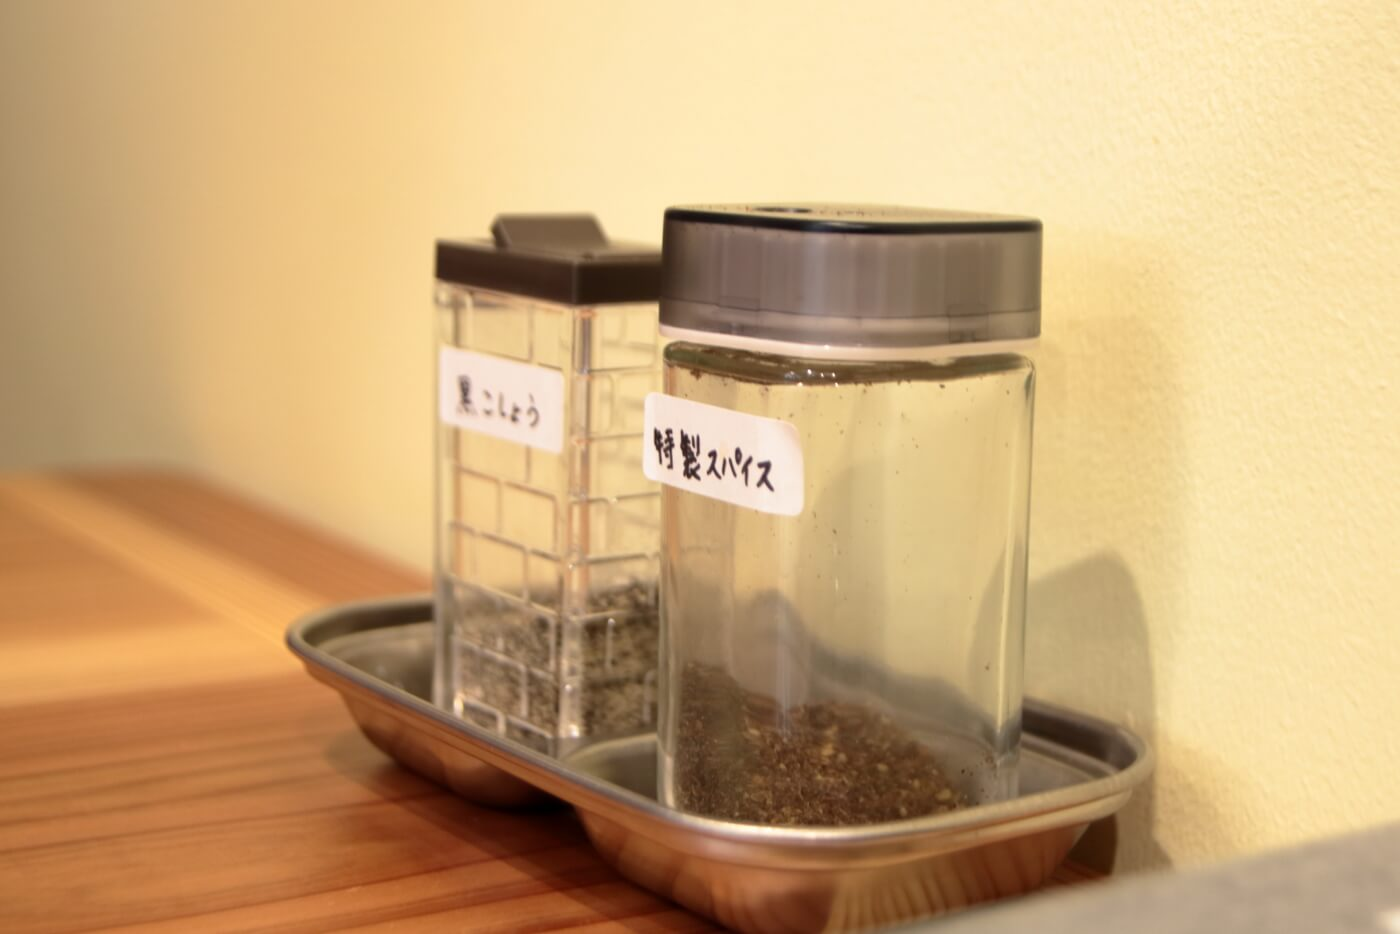 MONK 店内の卓上に置かれた調味料